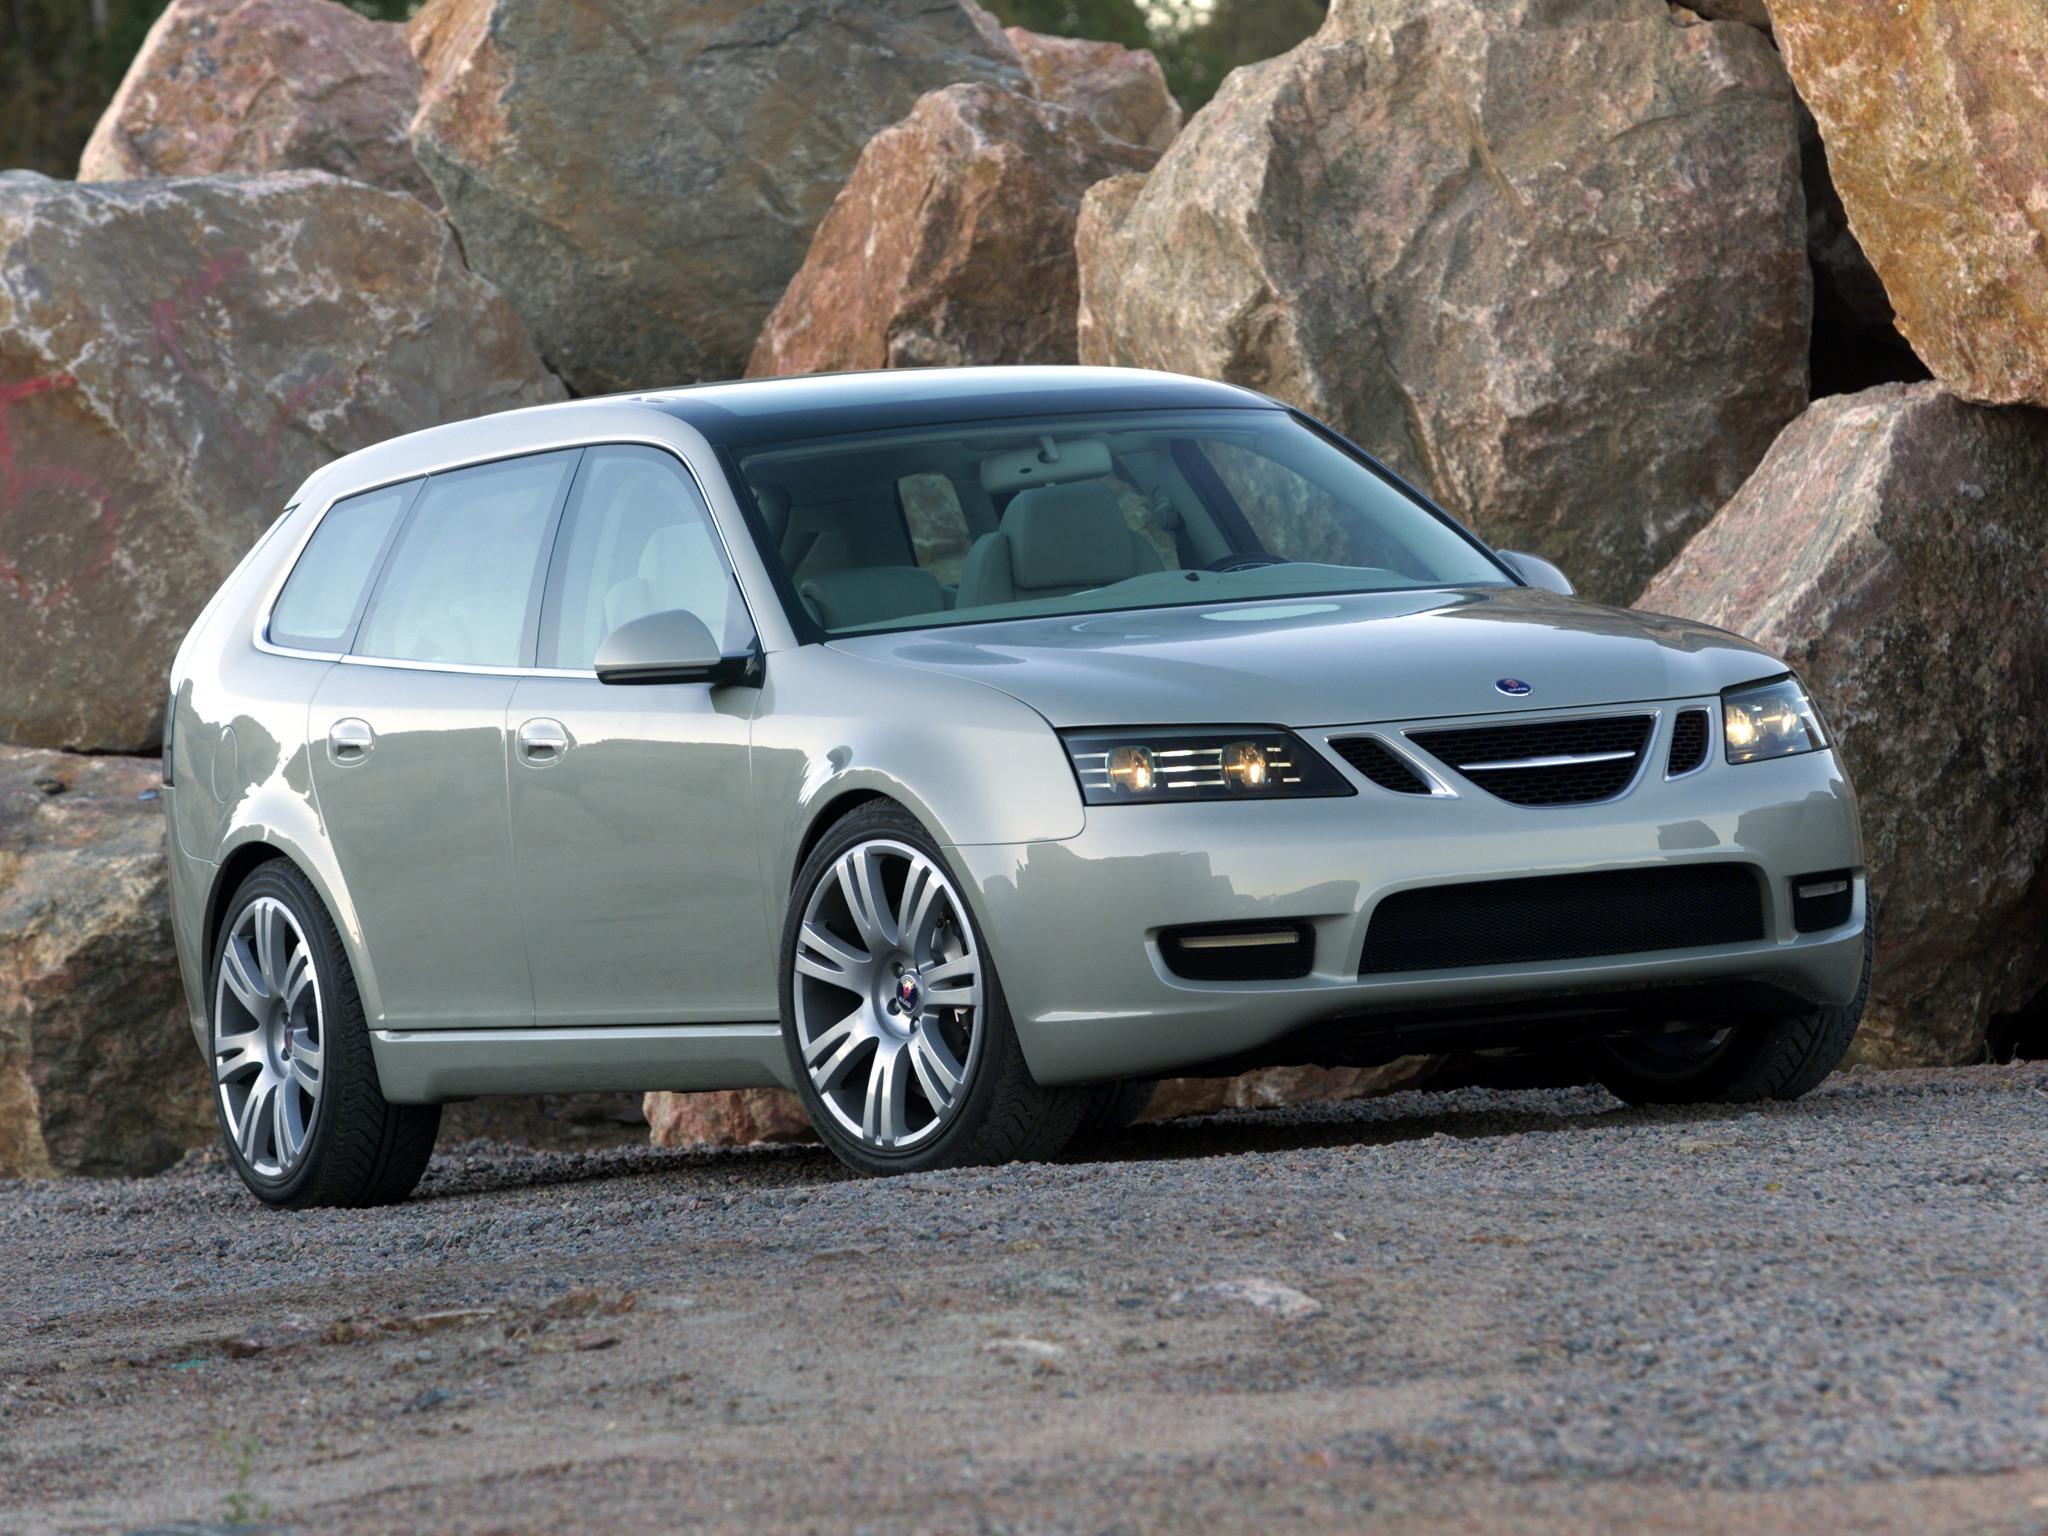 ... Saab_9 3_sport_hatch_concept_9 Saab_9 3_sport_hatch_concept_10